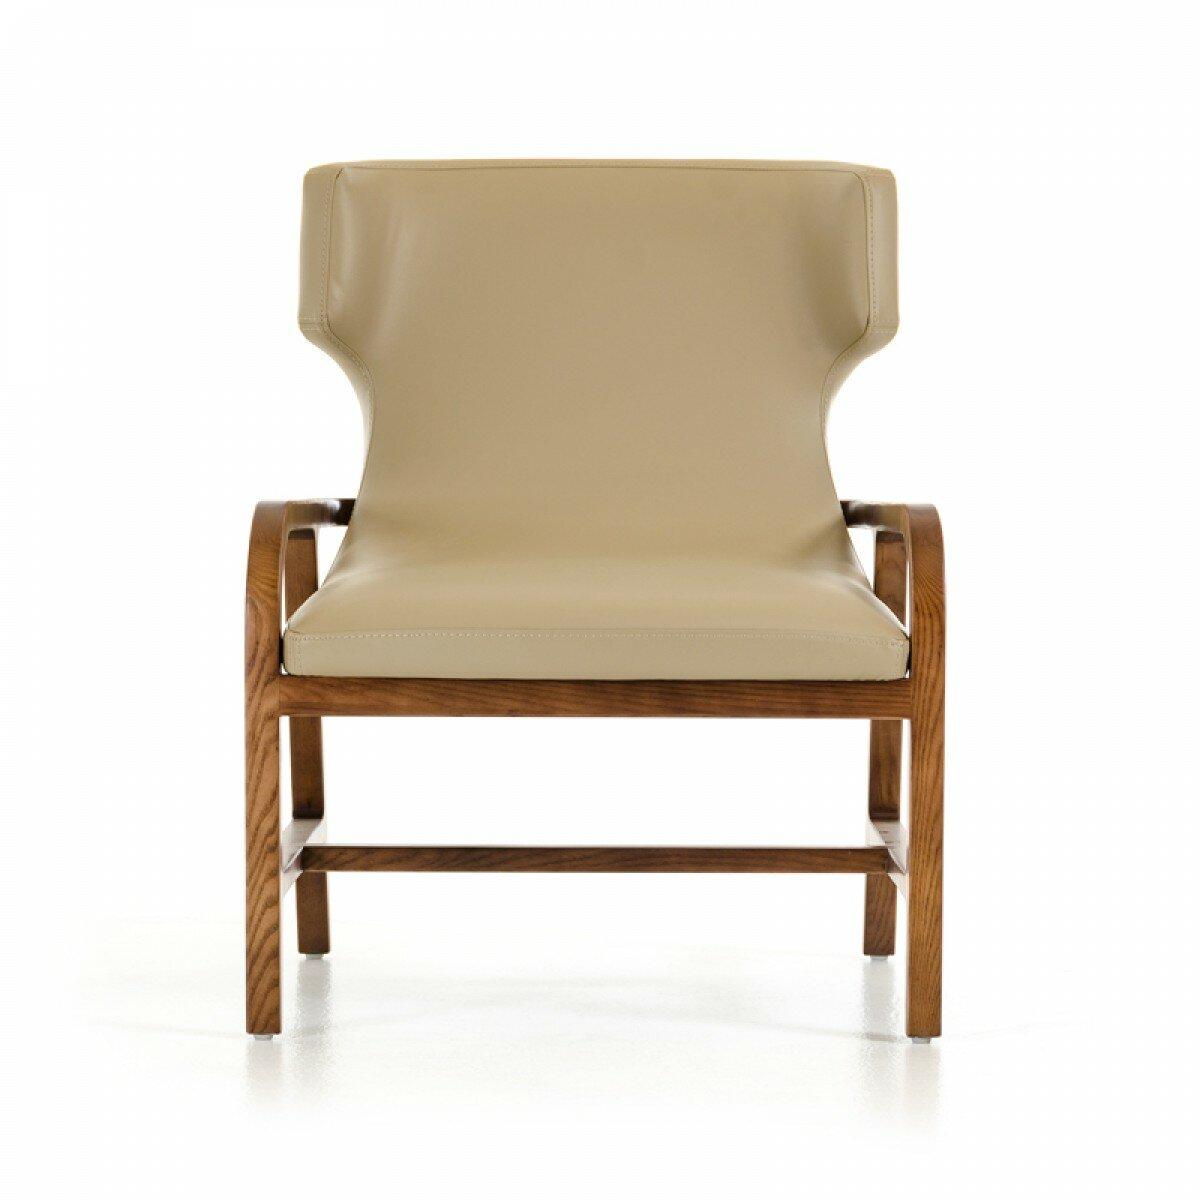 Brayden studio abram olenna modern arm chair wayfair for Modern arm chair